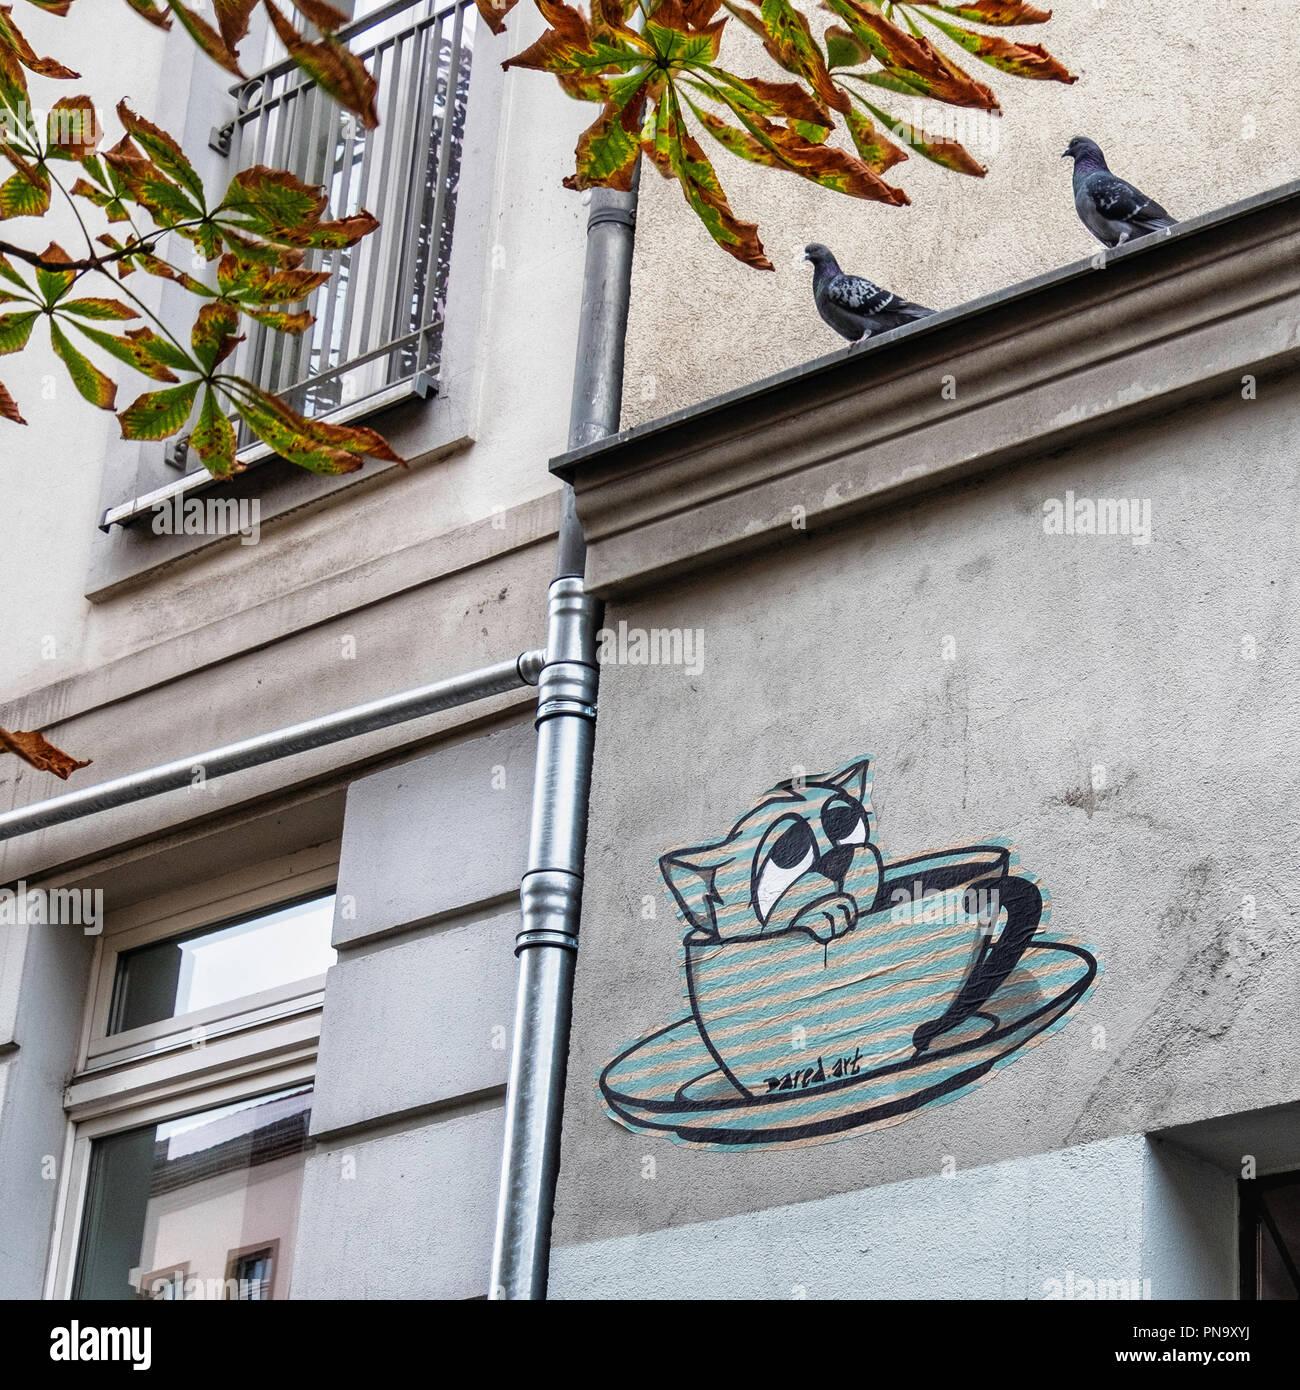 Berlin, Prenzlauer Berg. Urban street scene. Apartment building, two pigeons, diseased chestnut tree and street art paste-up by Dared - Stock Image